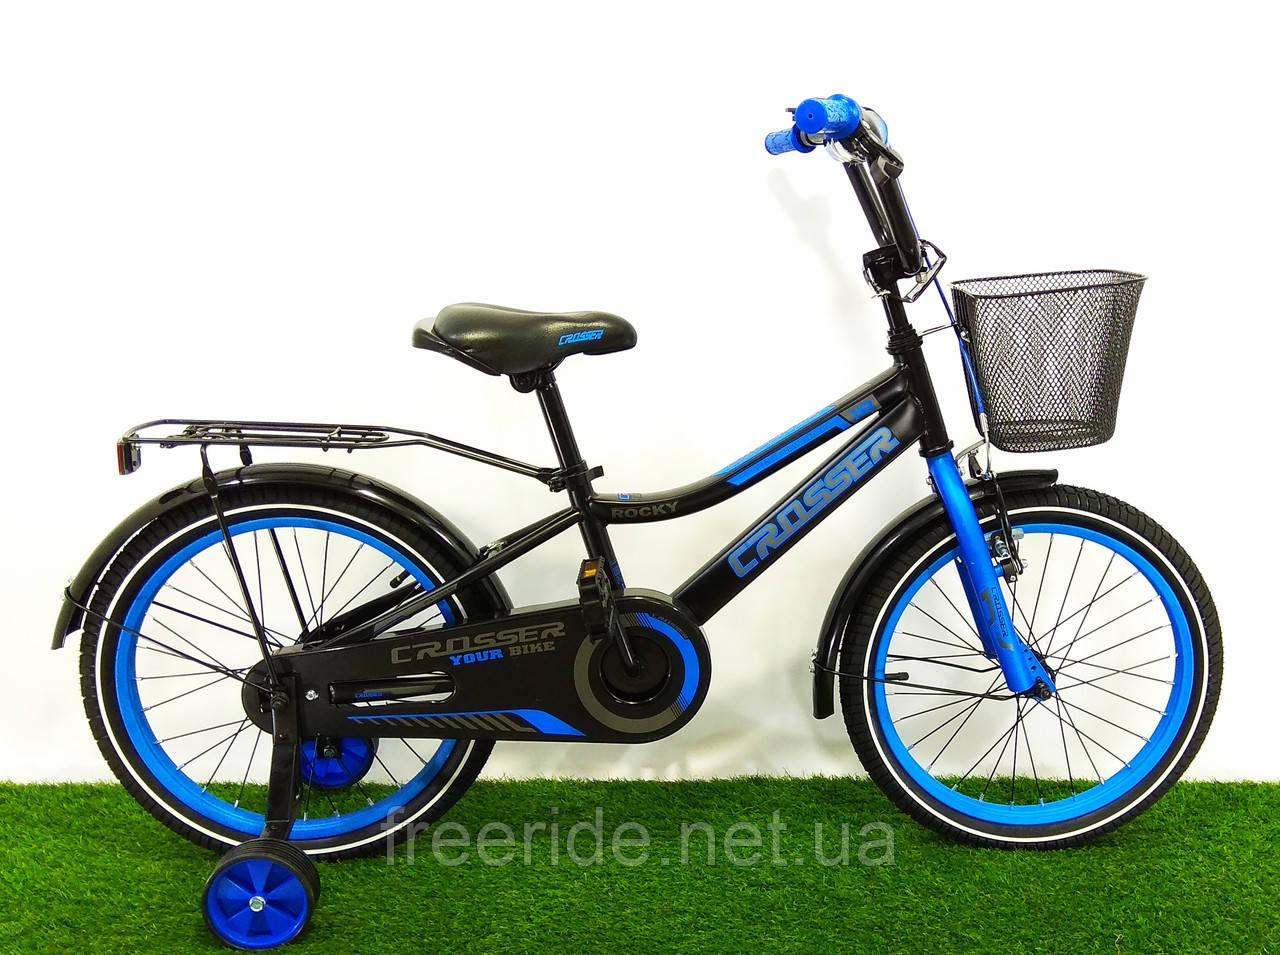 Детский Велосипед Crosser Rocky 20